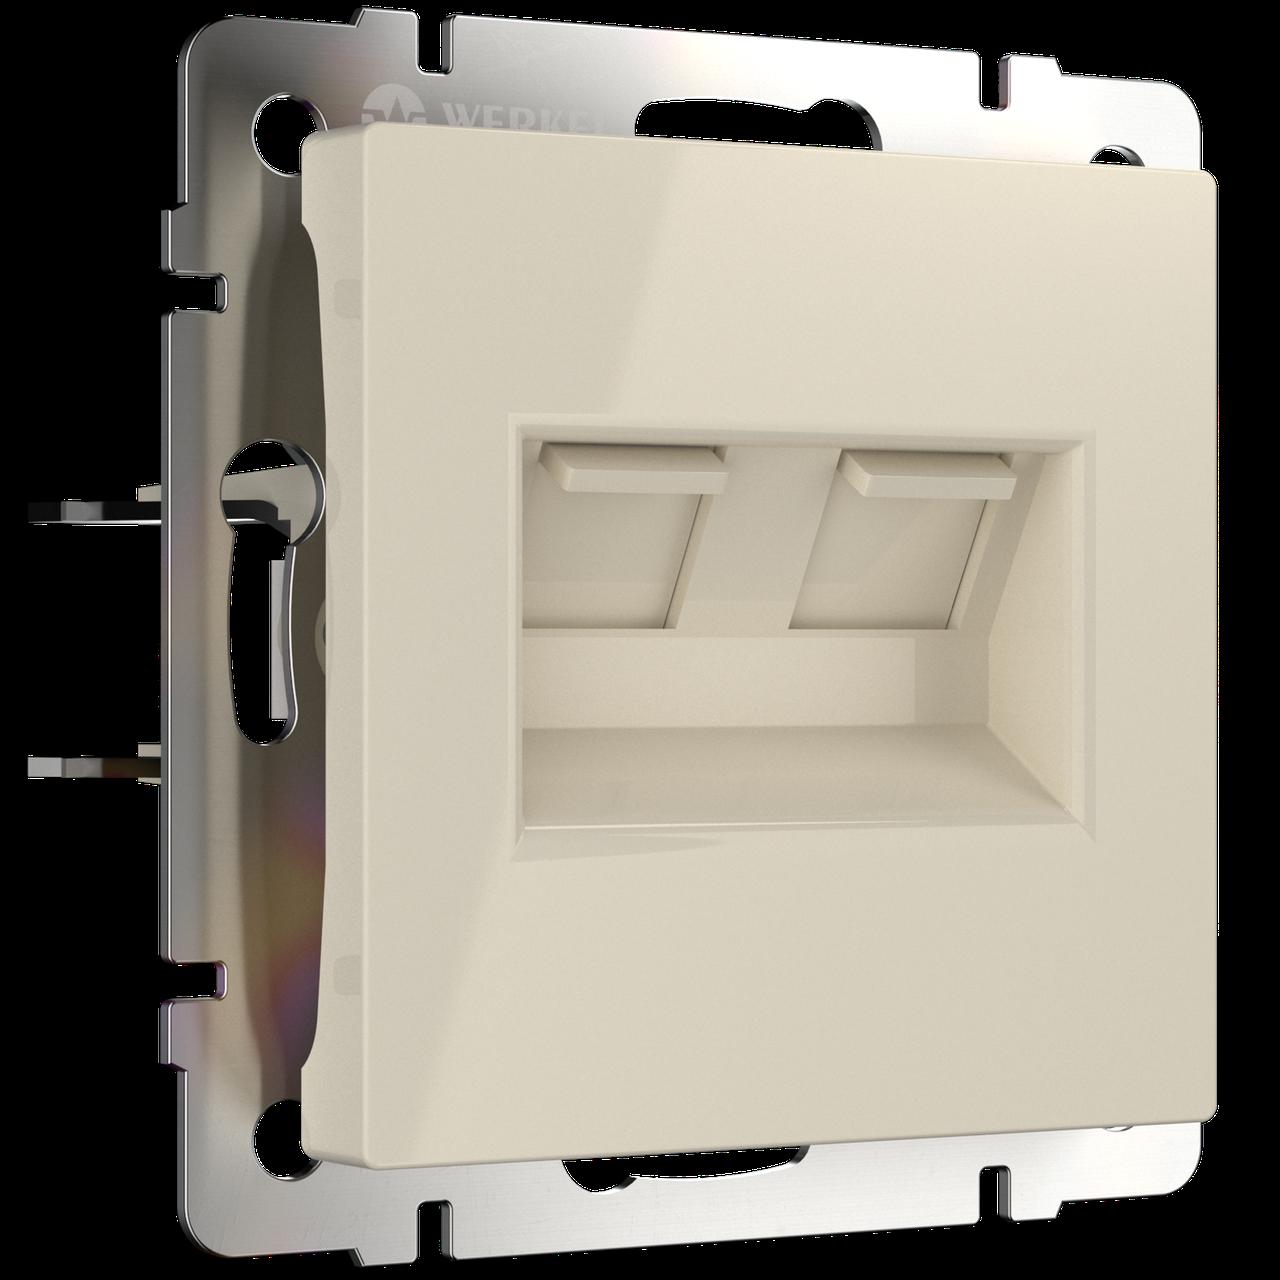 Розетка телефонная RJ-11 и Ethernet RJ-45 /WL05-RJ11-45-white (белая)